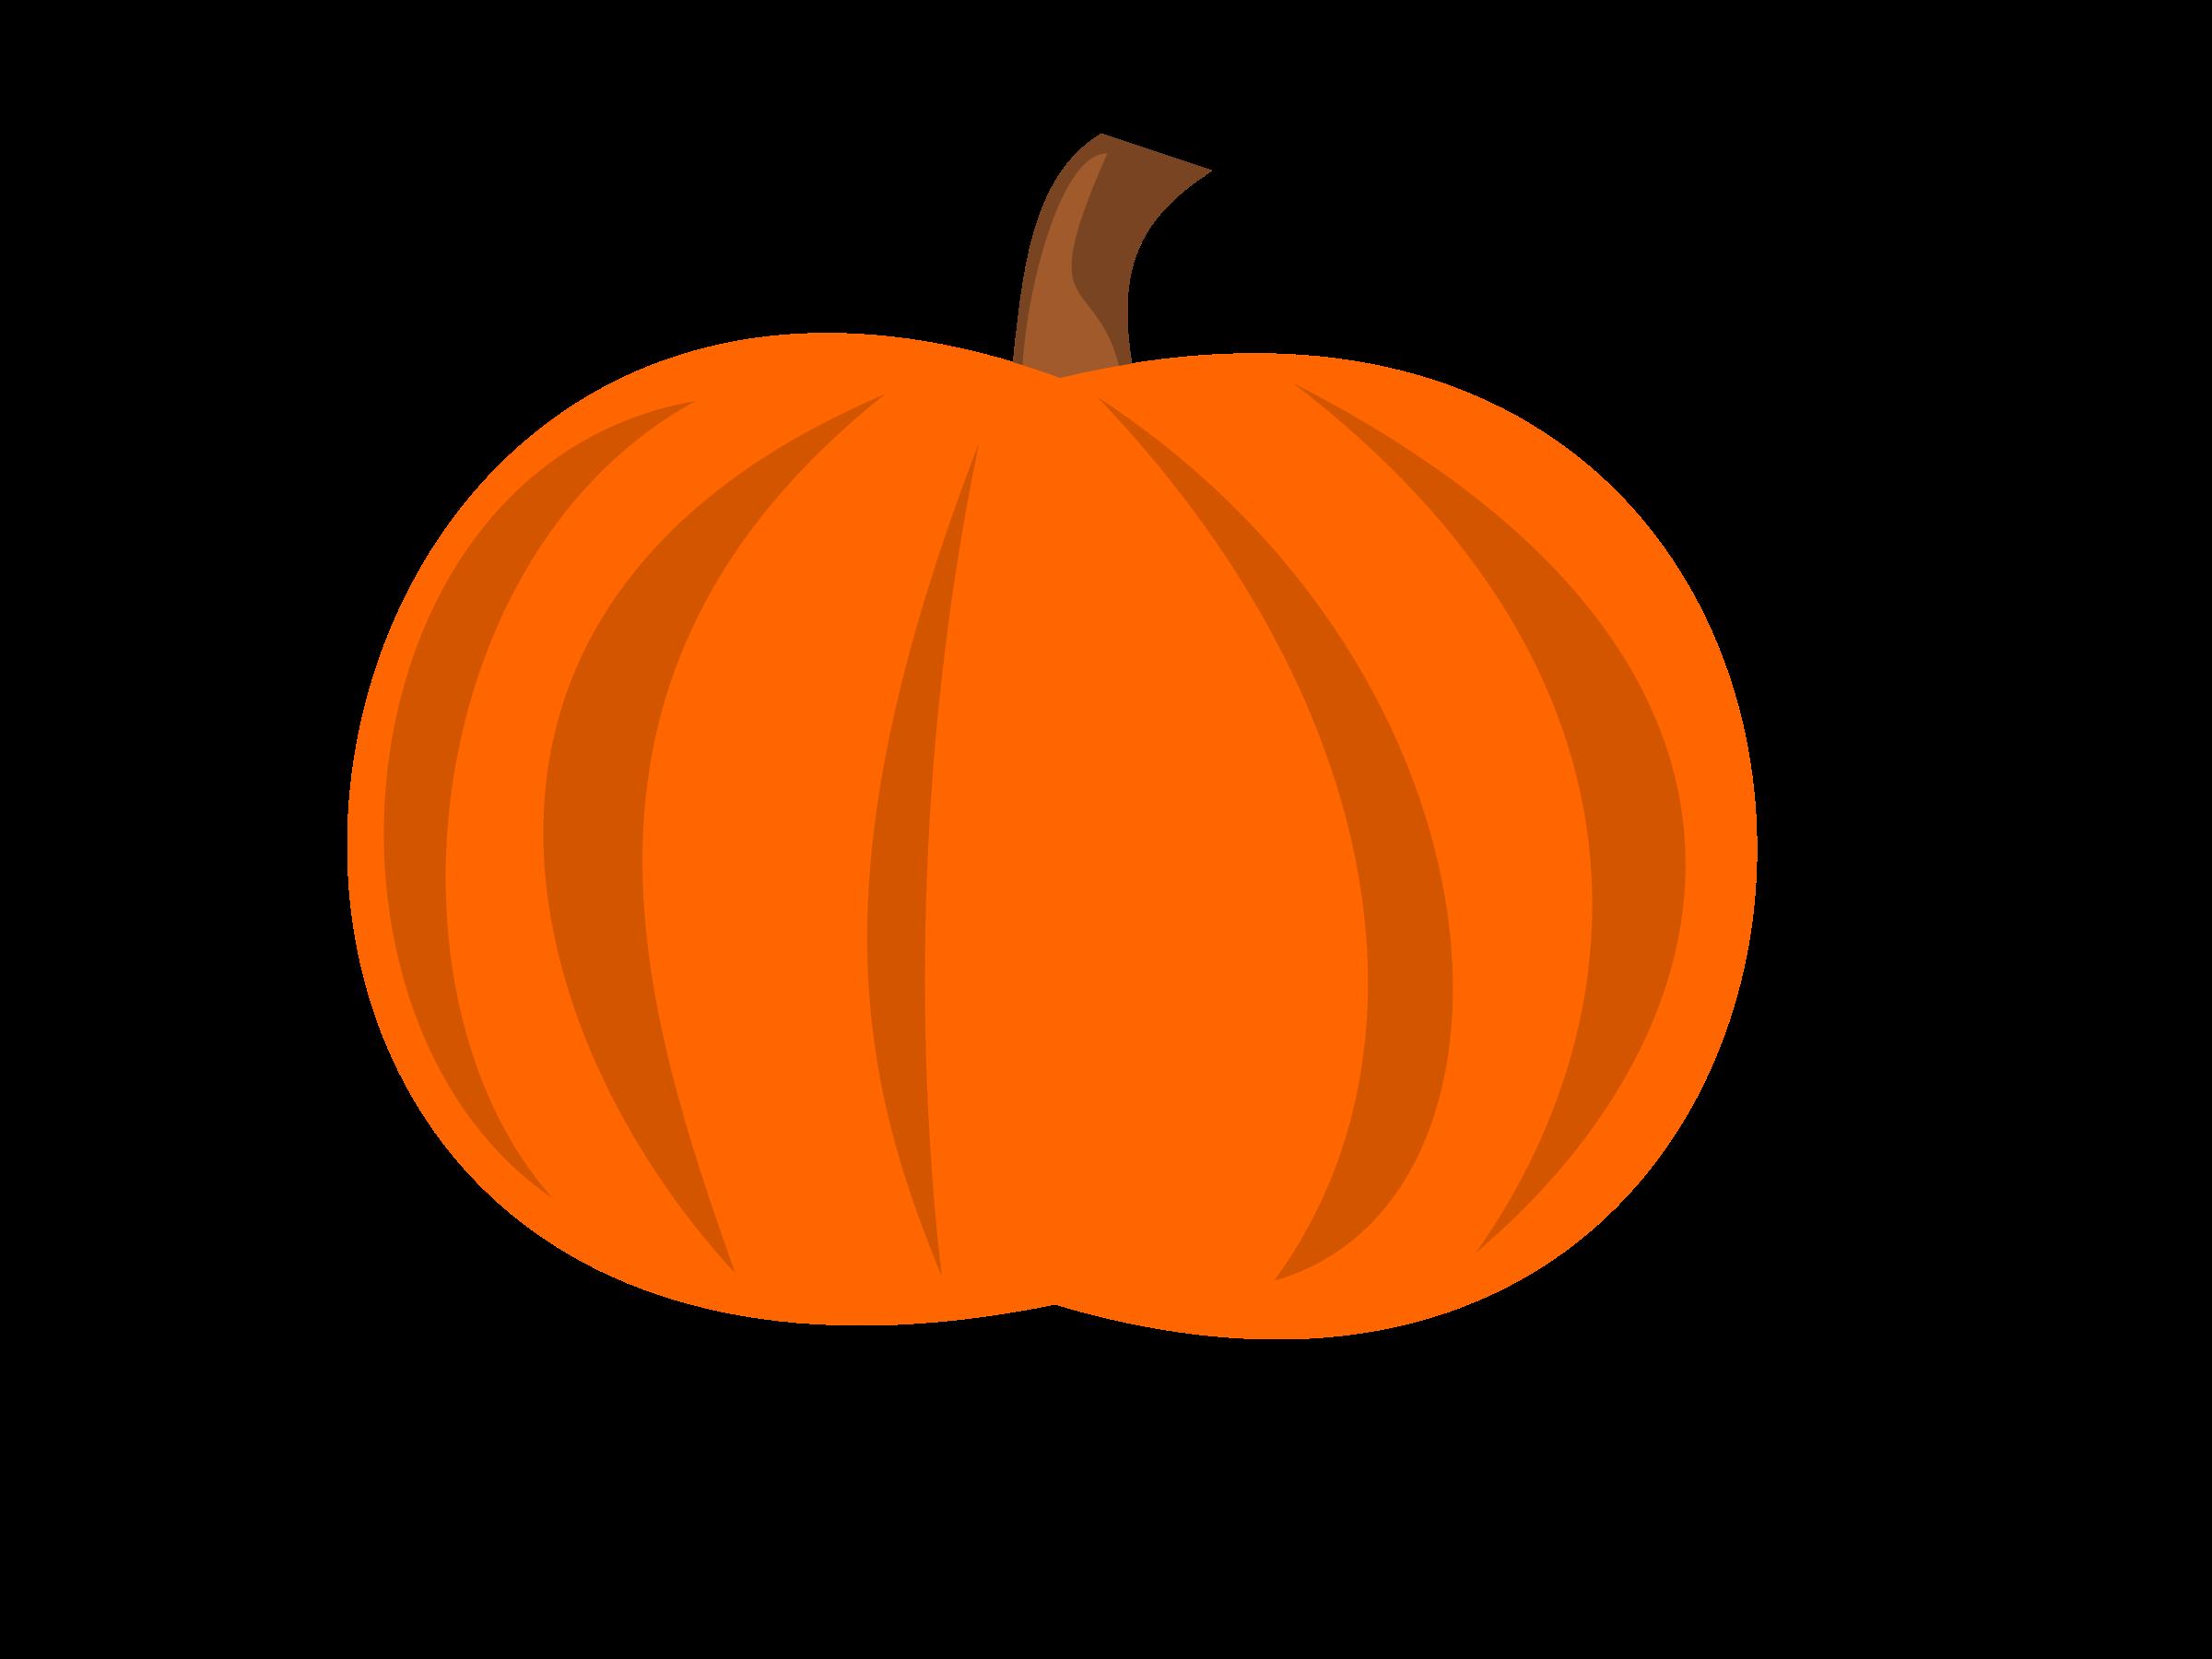 2400x1800 Pumpkin Clipart Biezumd 3